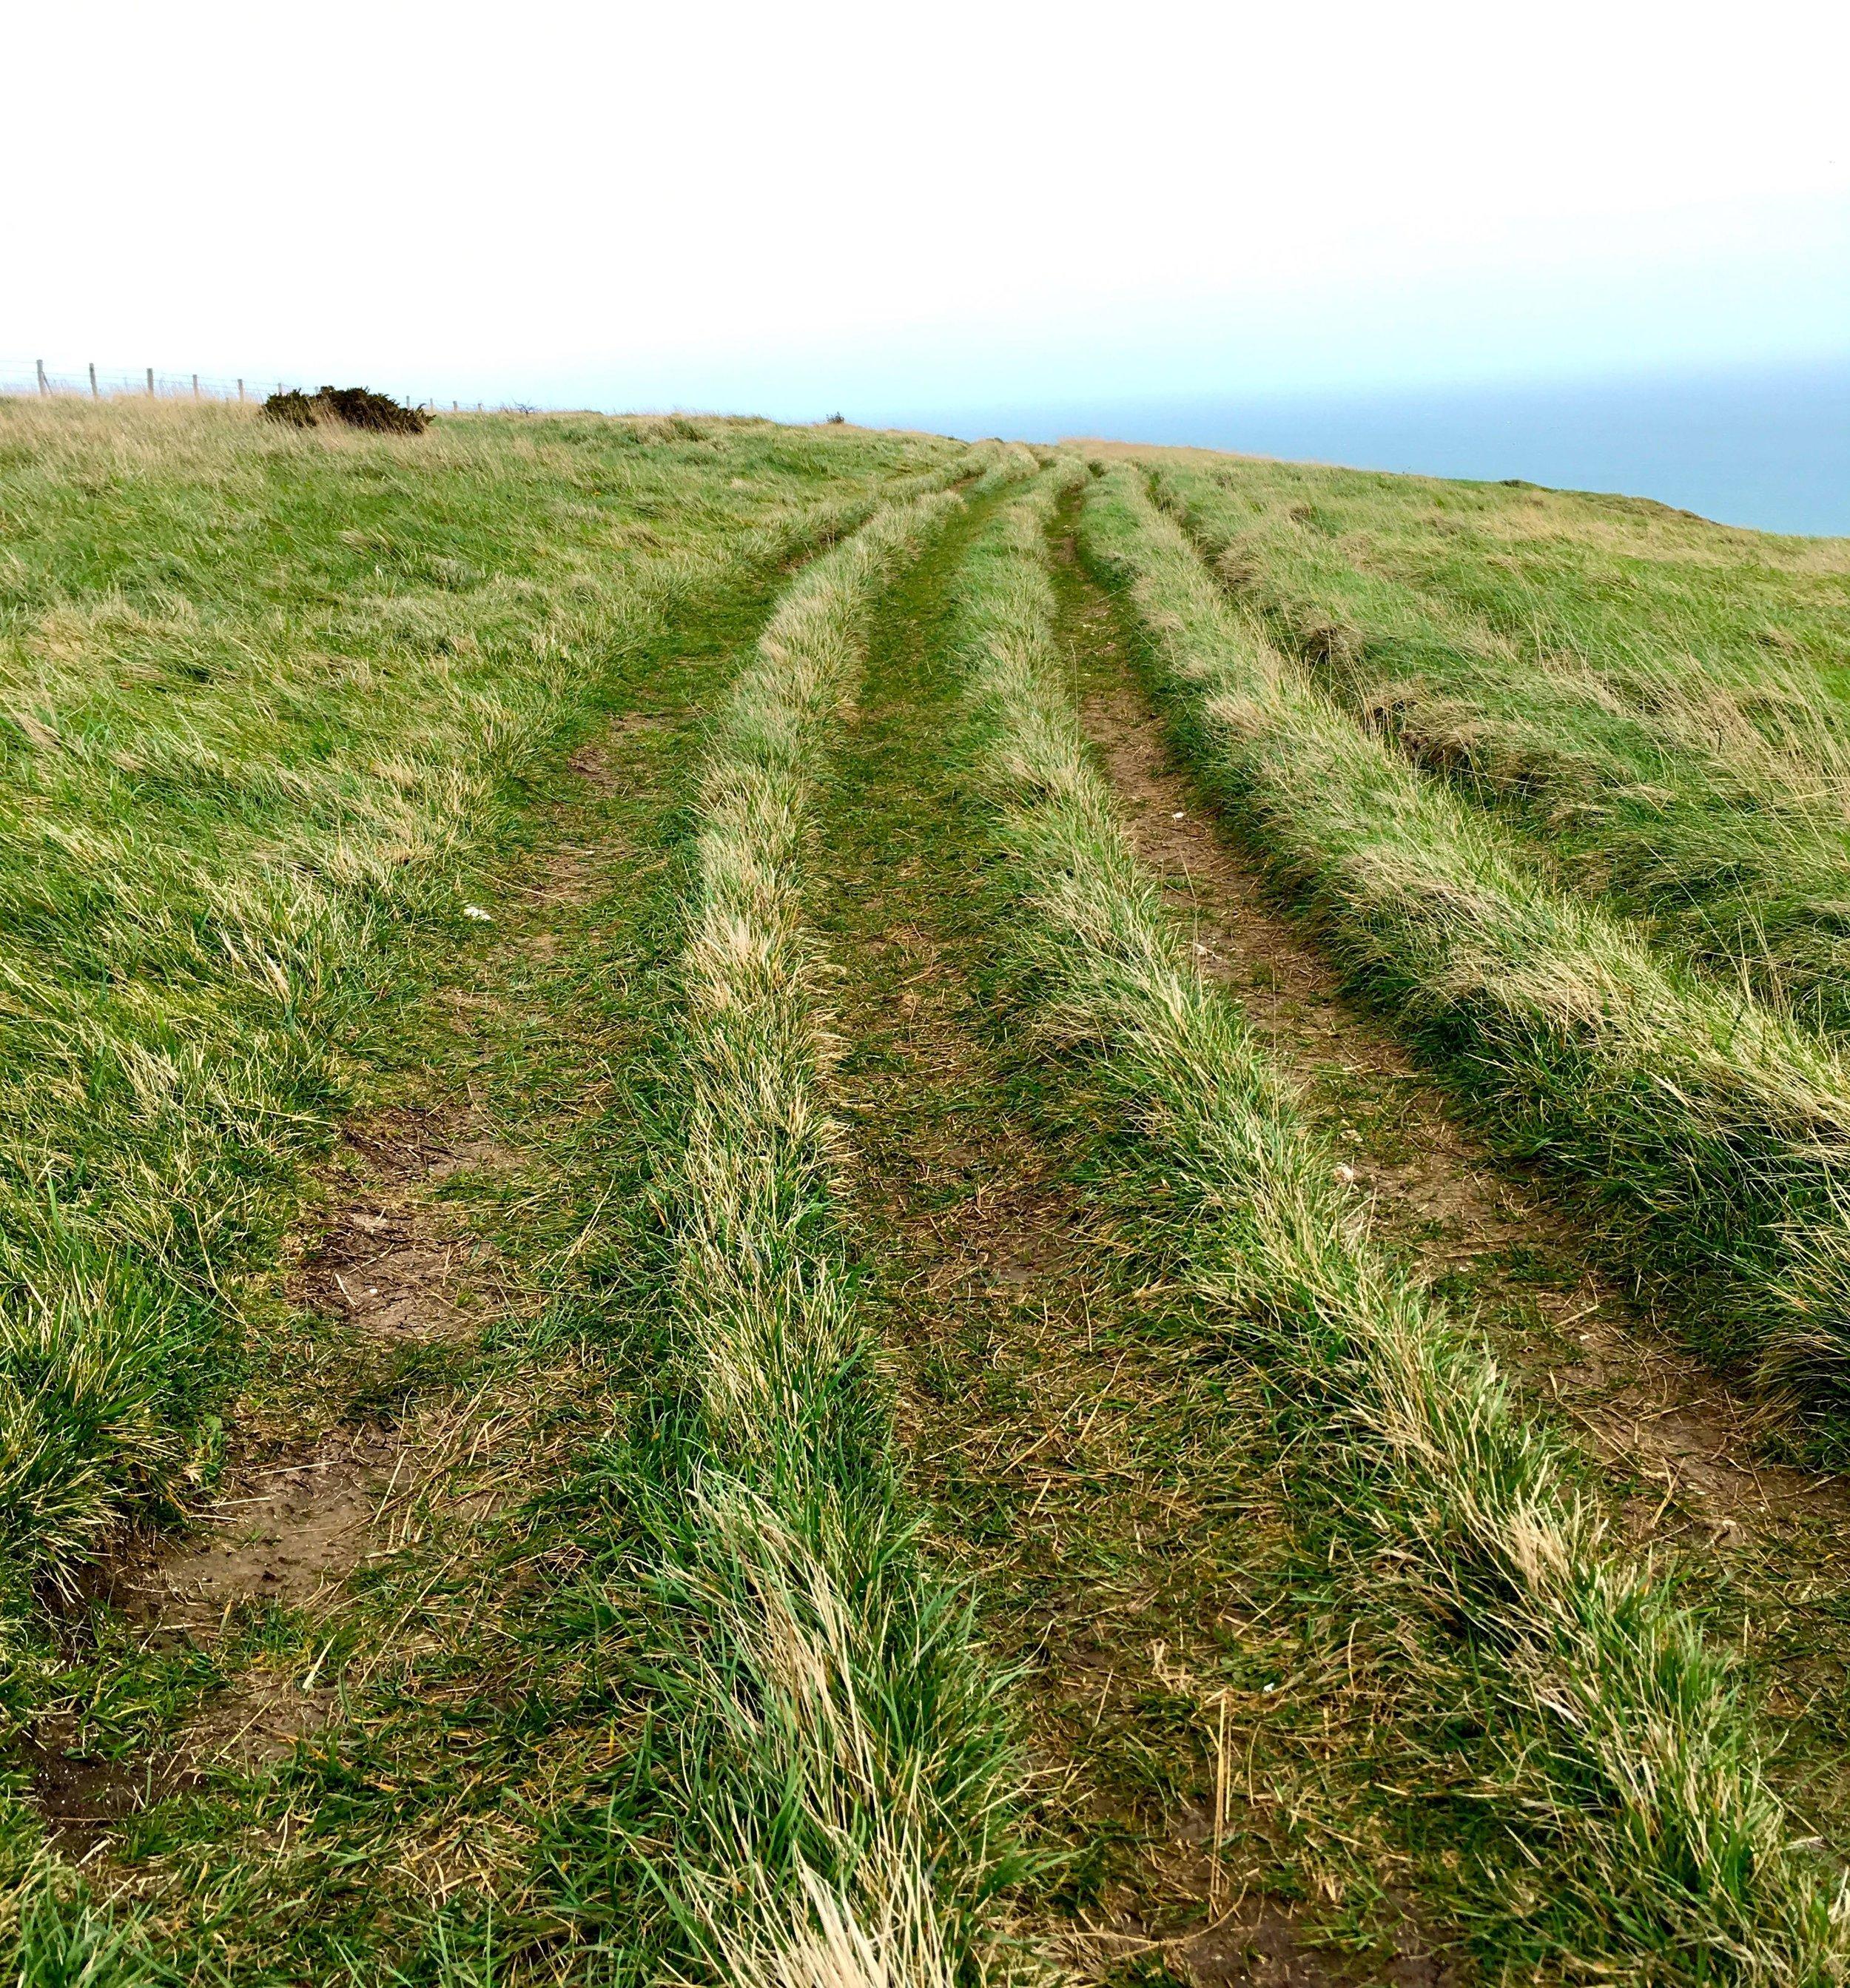 Walking along the burrows of the coastal path towards Old Harry rocks in Dorset